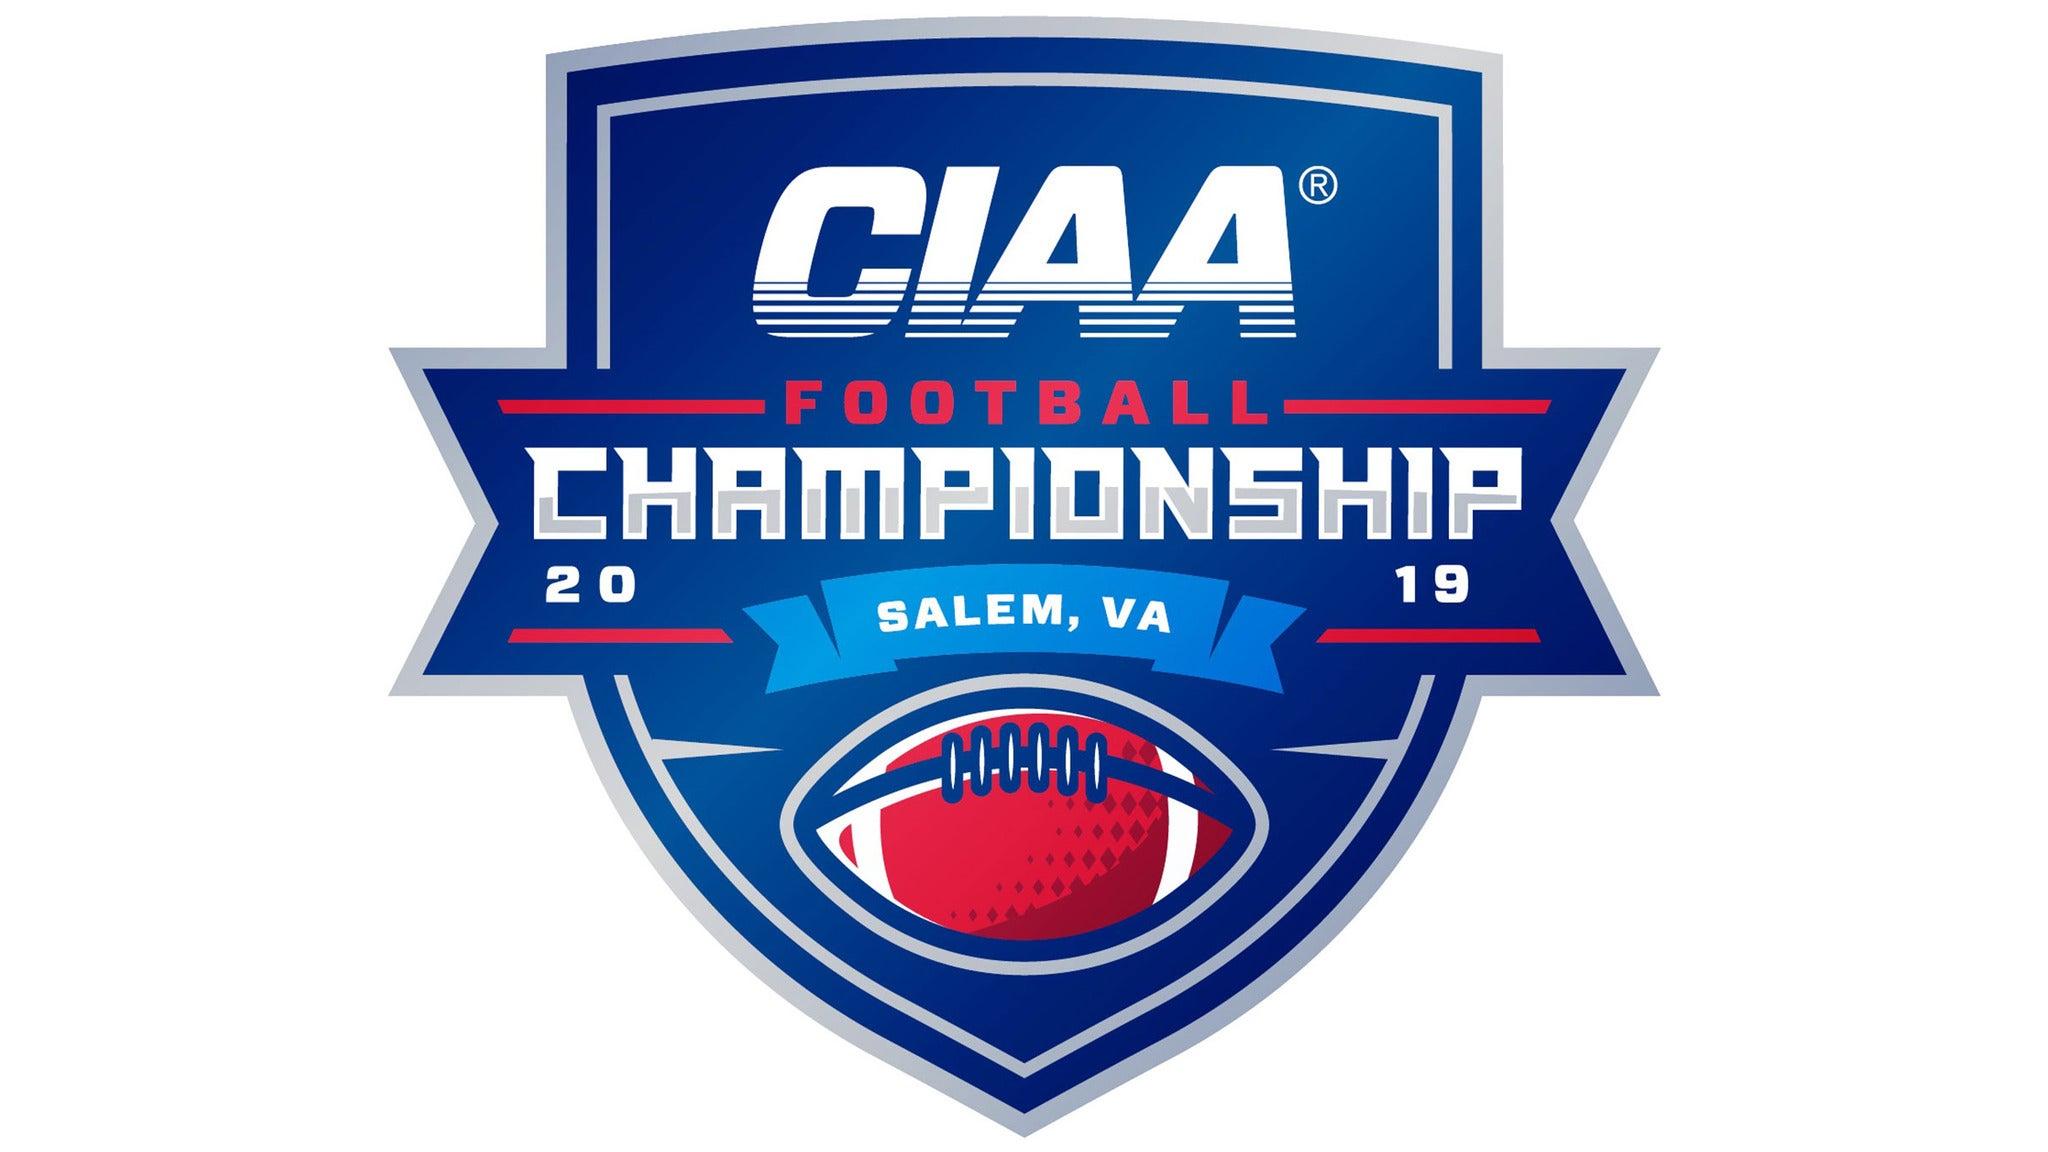 CIAA Football Championship at Salem Civic Center